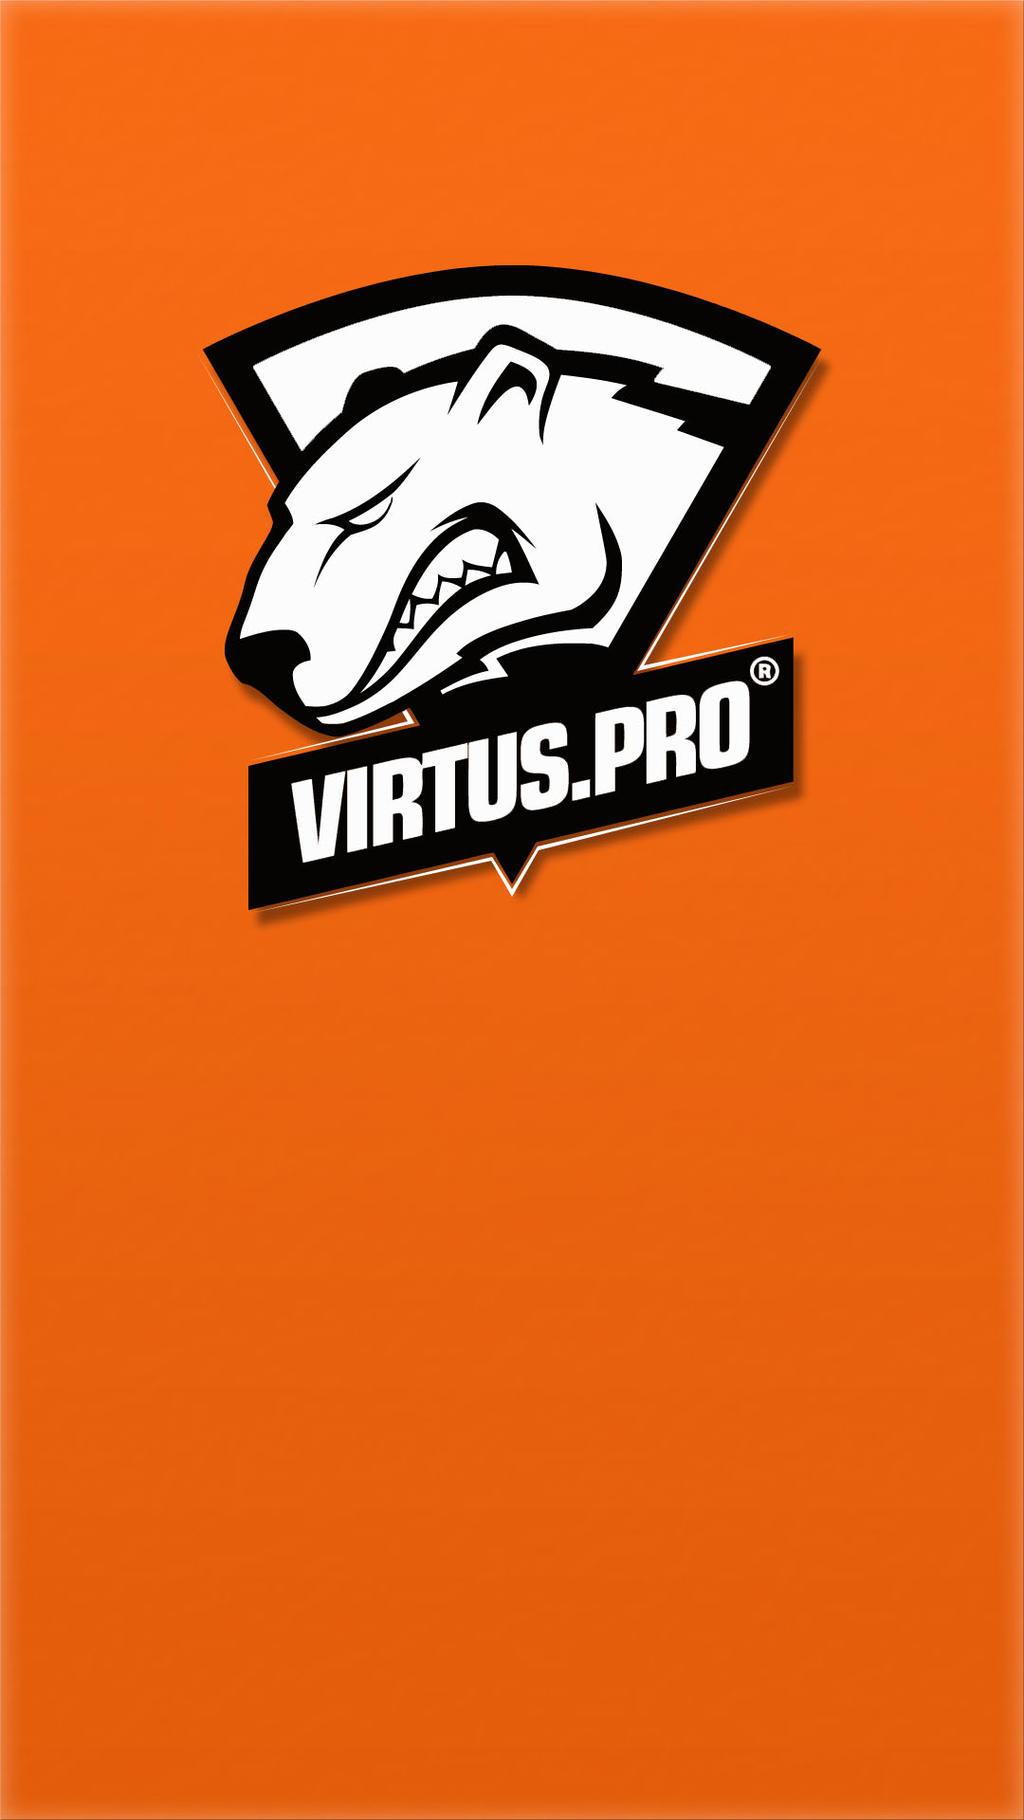 Virtus Pro Members